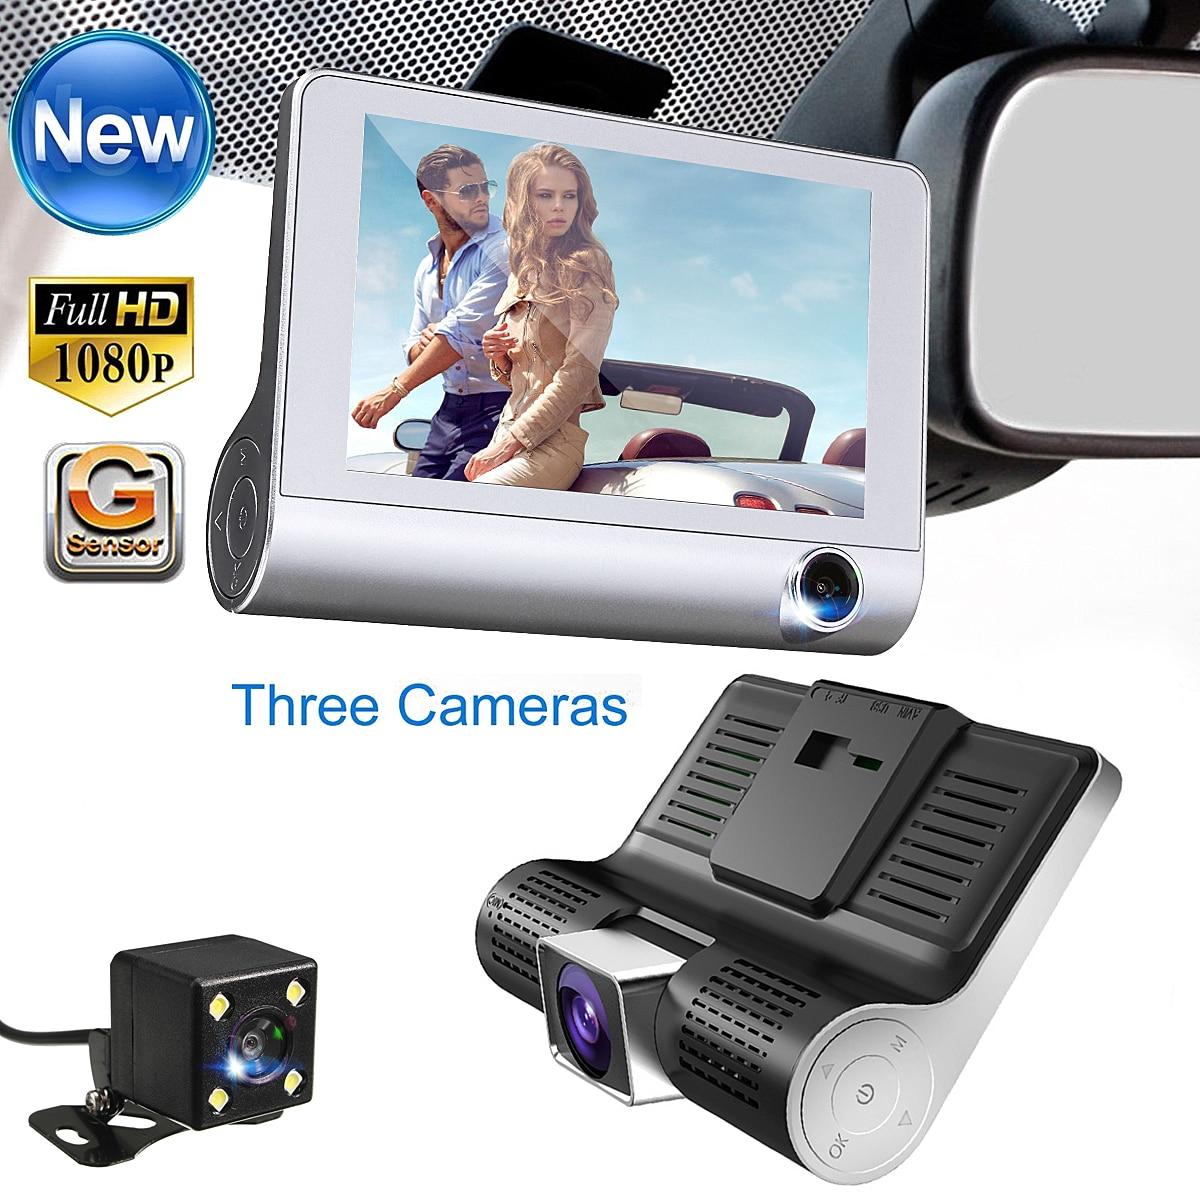 4,0 ''3 Weg Auto DVR Kamera Video Recorder Rückansicht Auto Registrator Mit Zwei Kameras Dash Cam DVRS Dual objektiv + Backup-Kamera